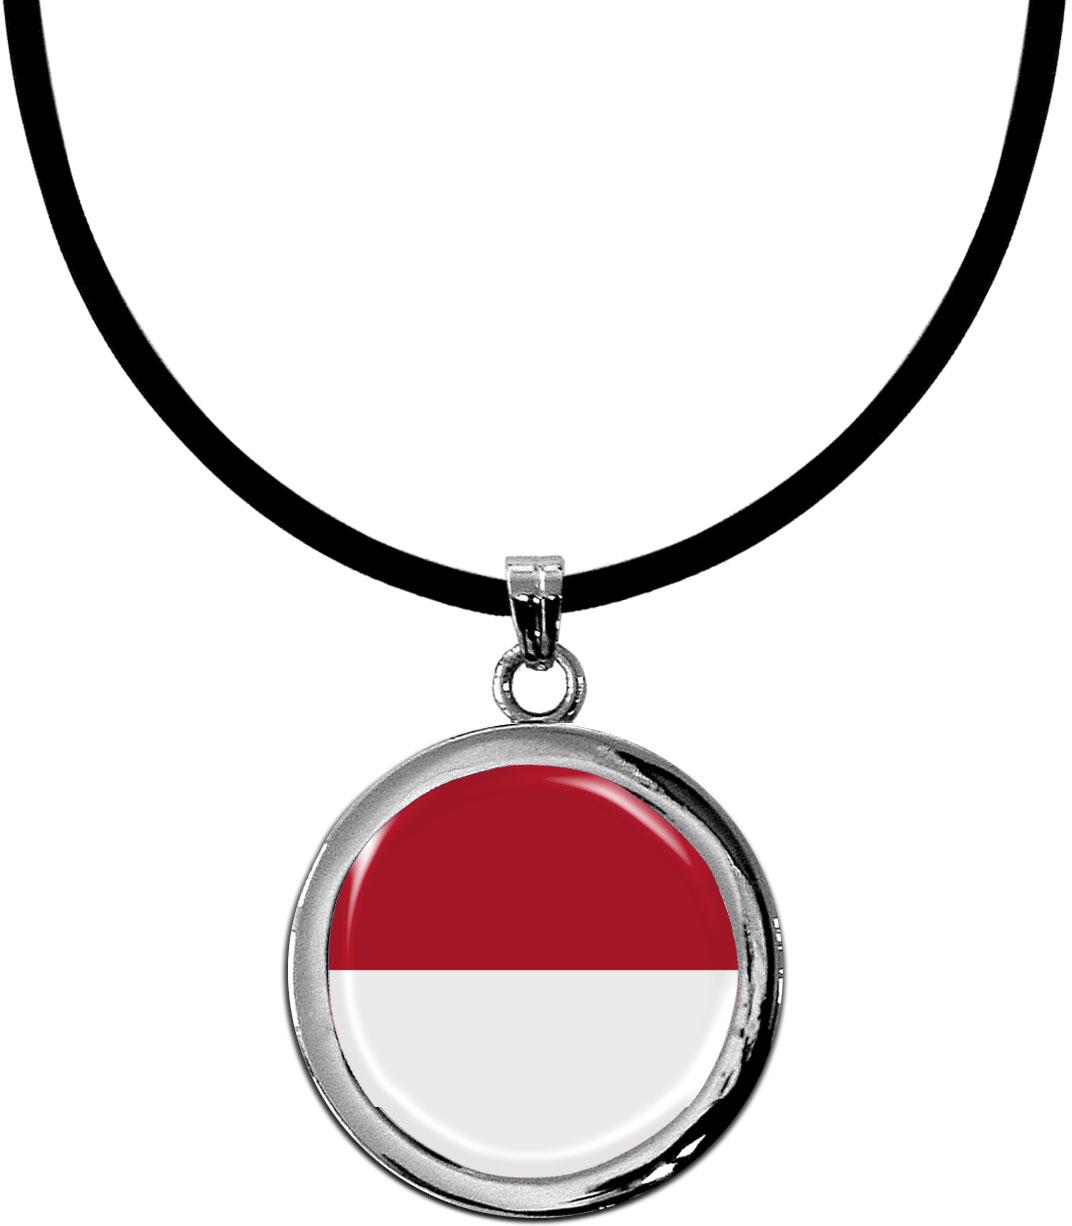 Kettenanhänger / Monaco / Silikonband mit Silberverschluss